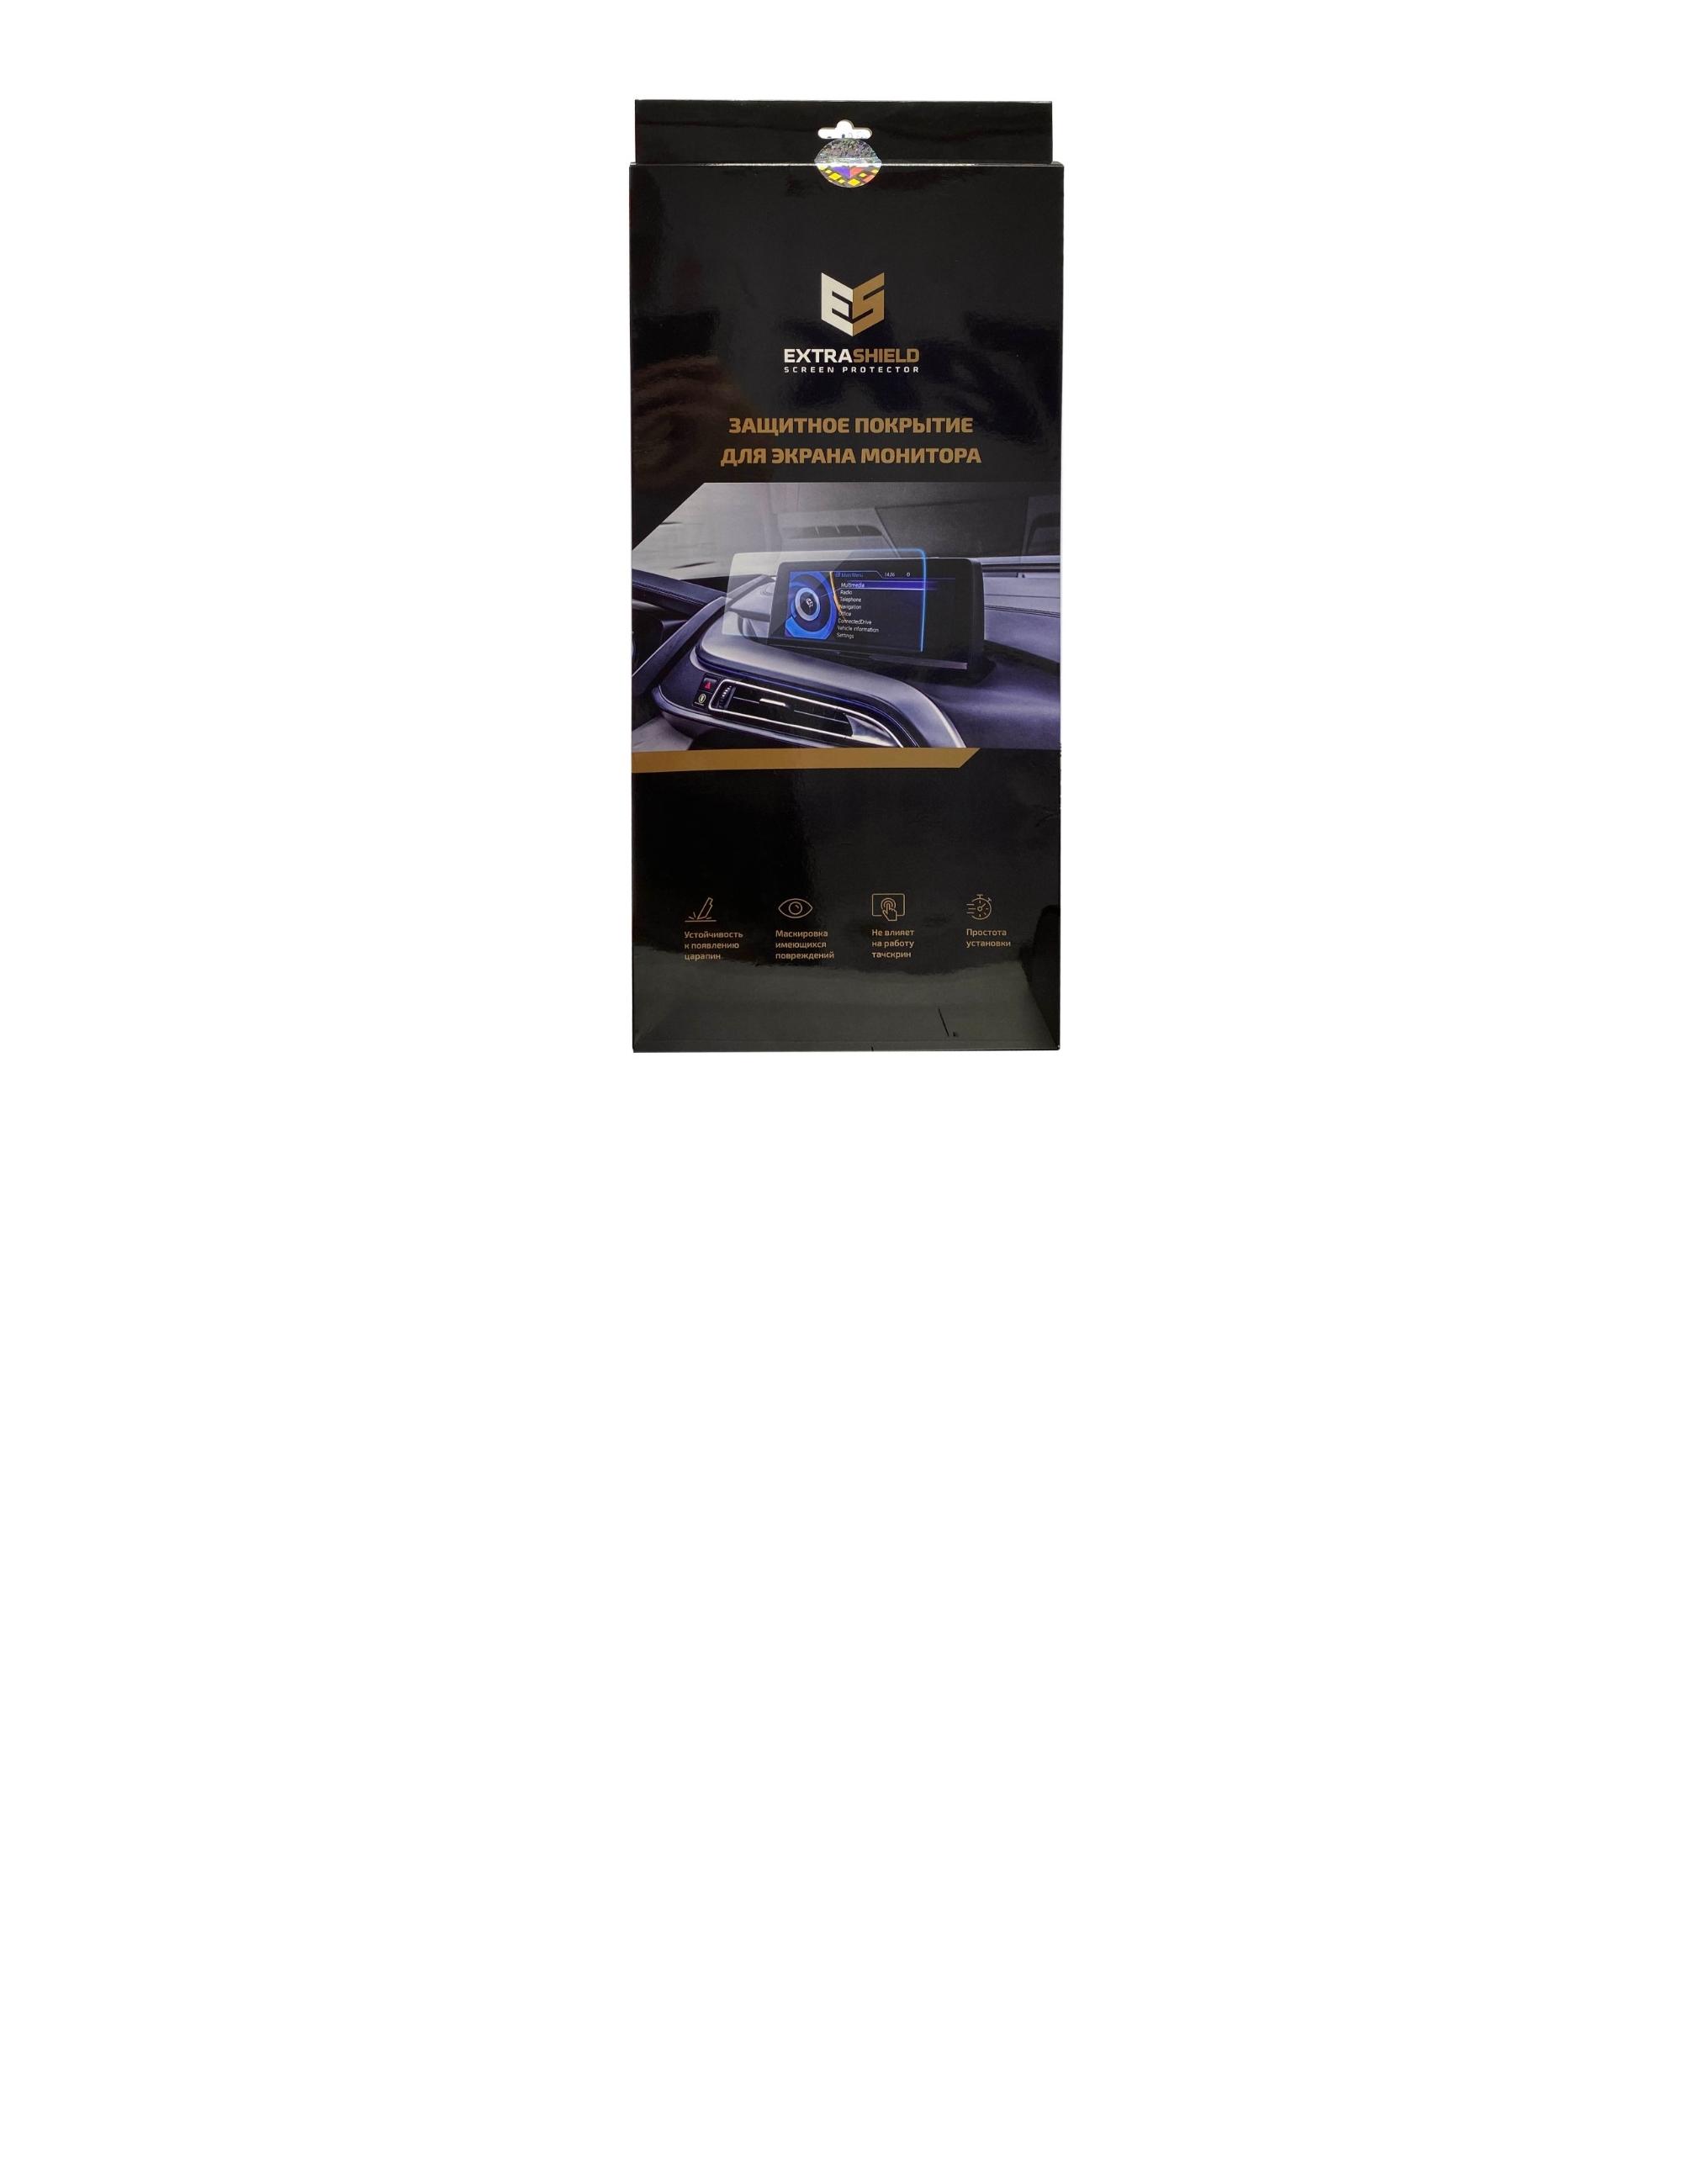 Volkswagen Terramont 2016 - 2020 мультимедиа Discover Media 8 Защитное стекло Матовая